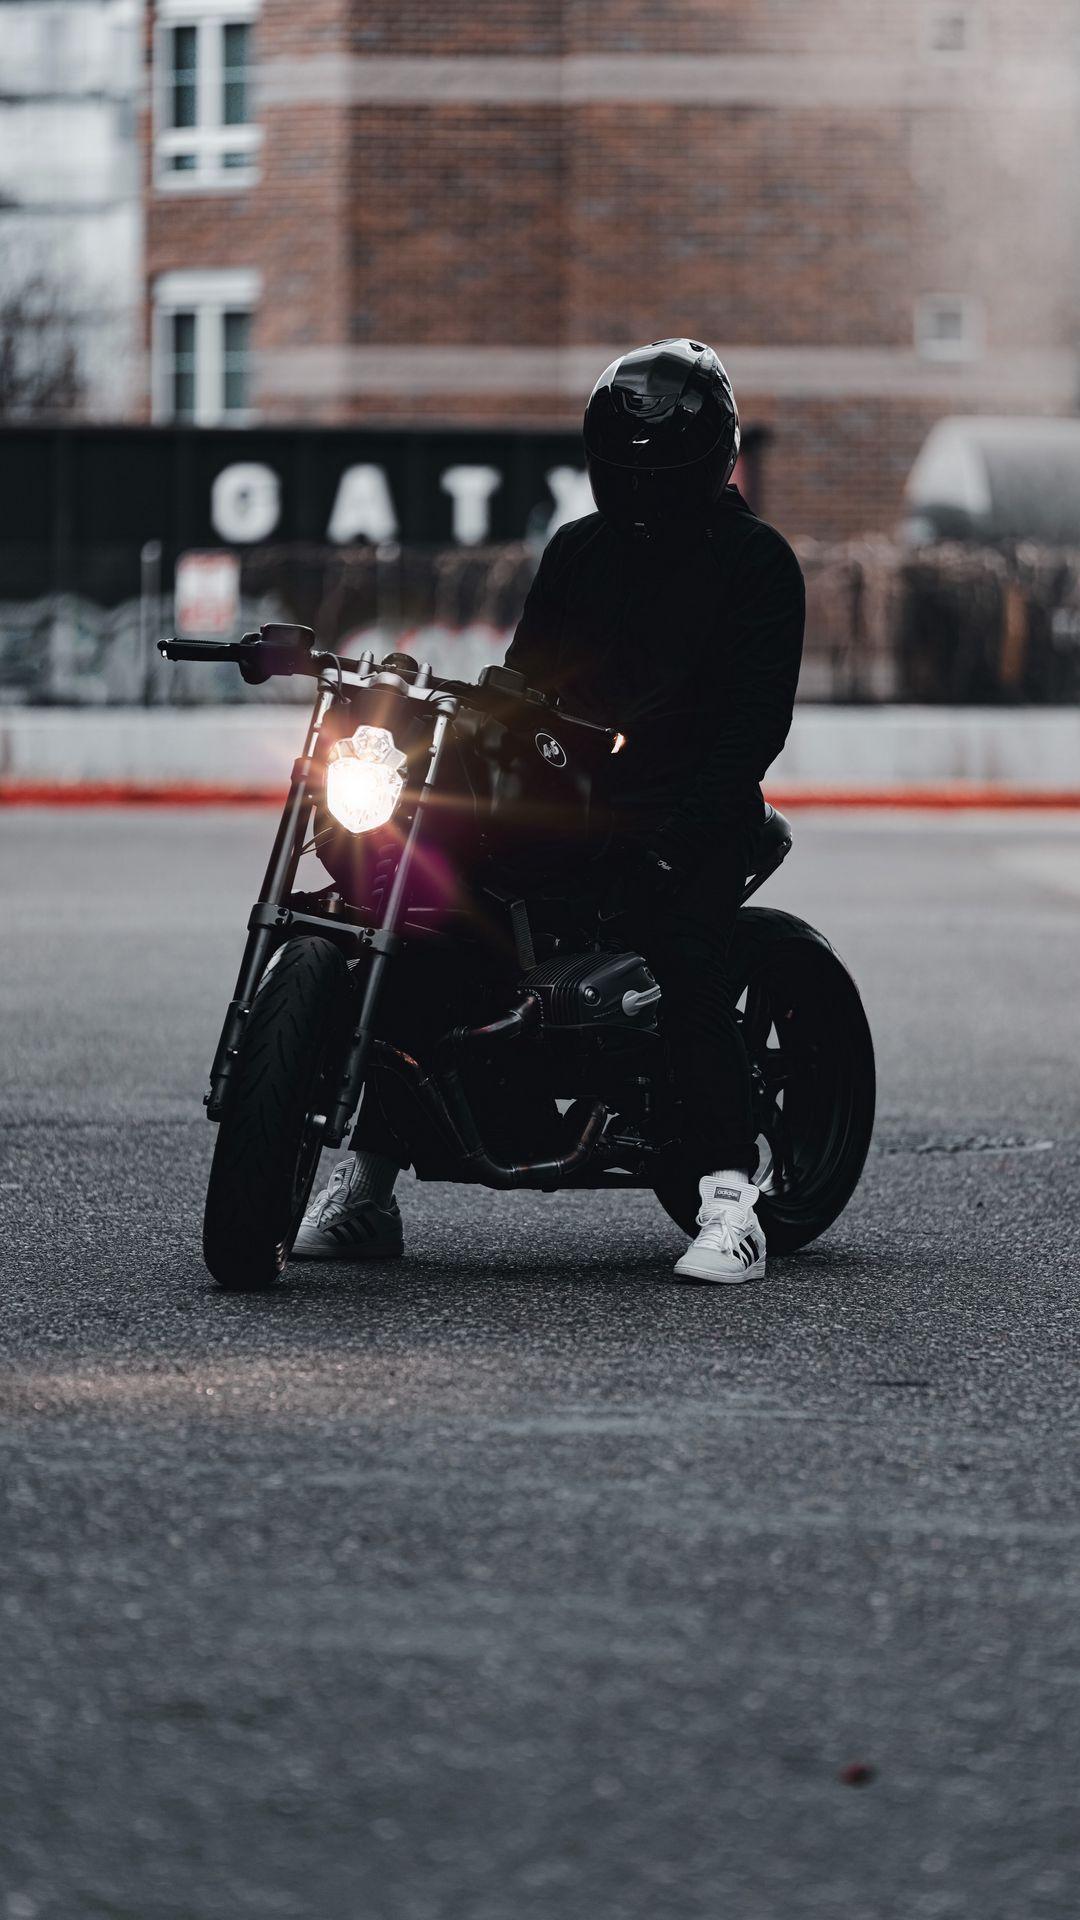 1080x1920 Обои мотоцикл, байк, мотоциклист, черный, свет, дорога